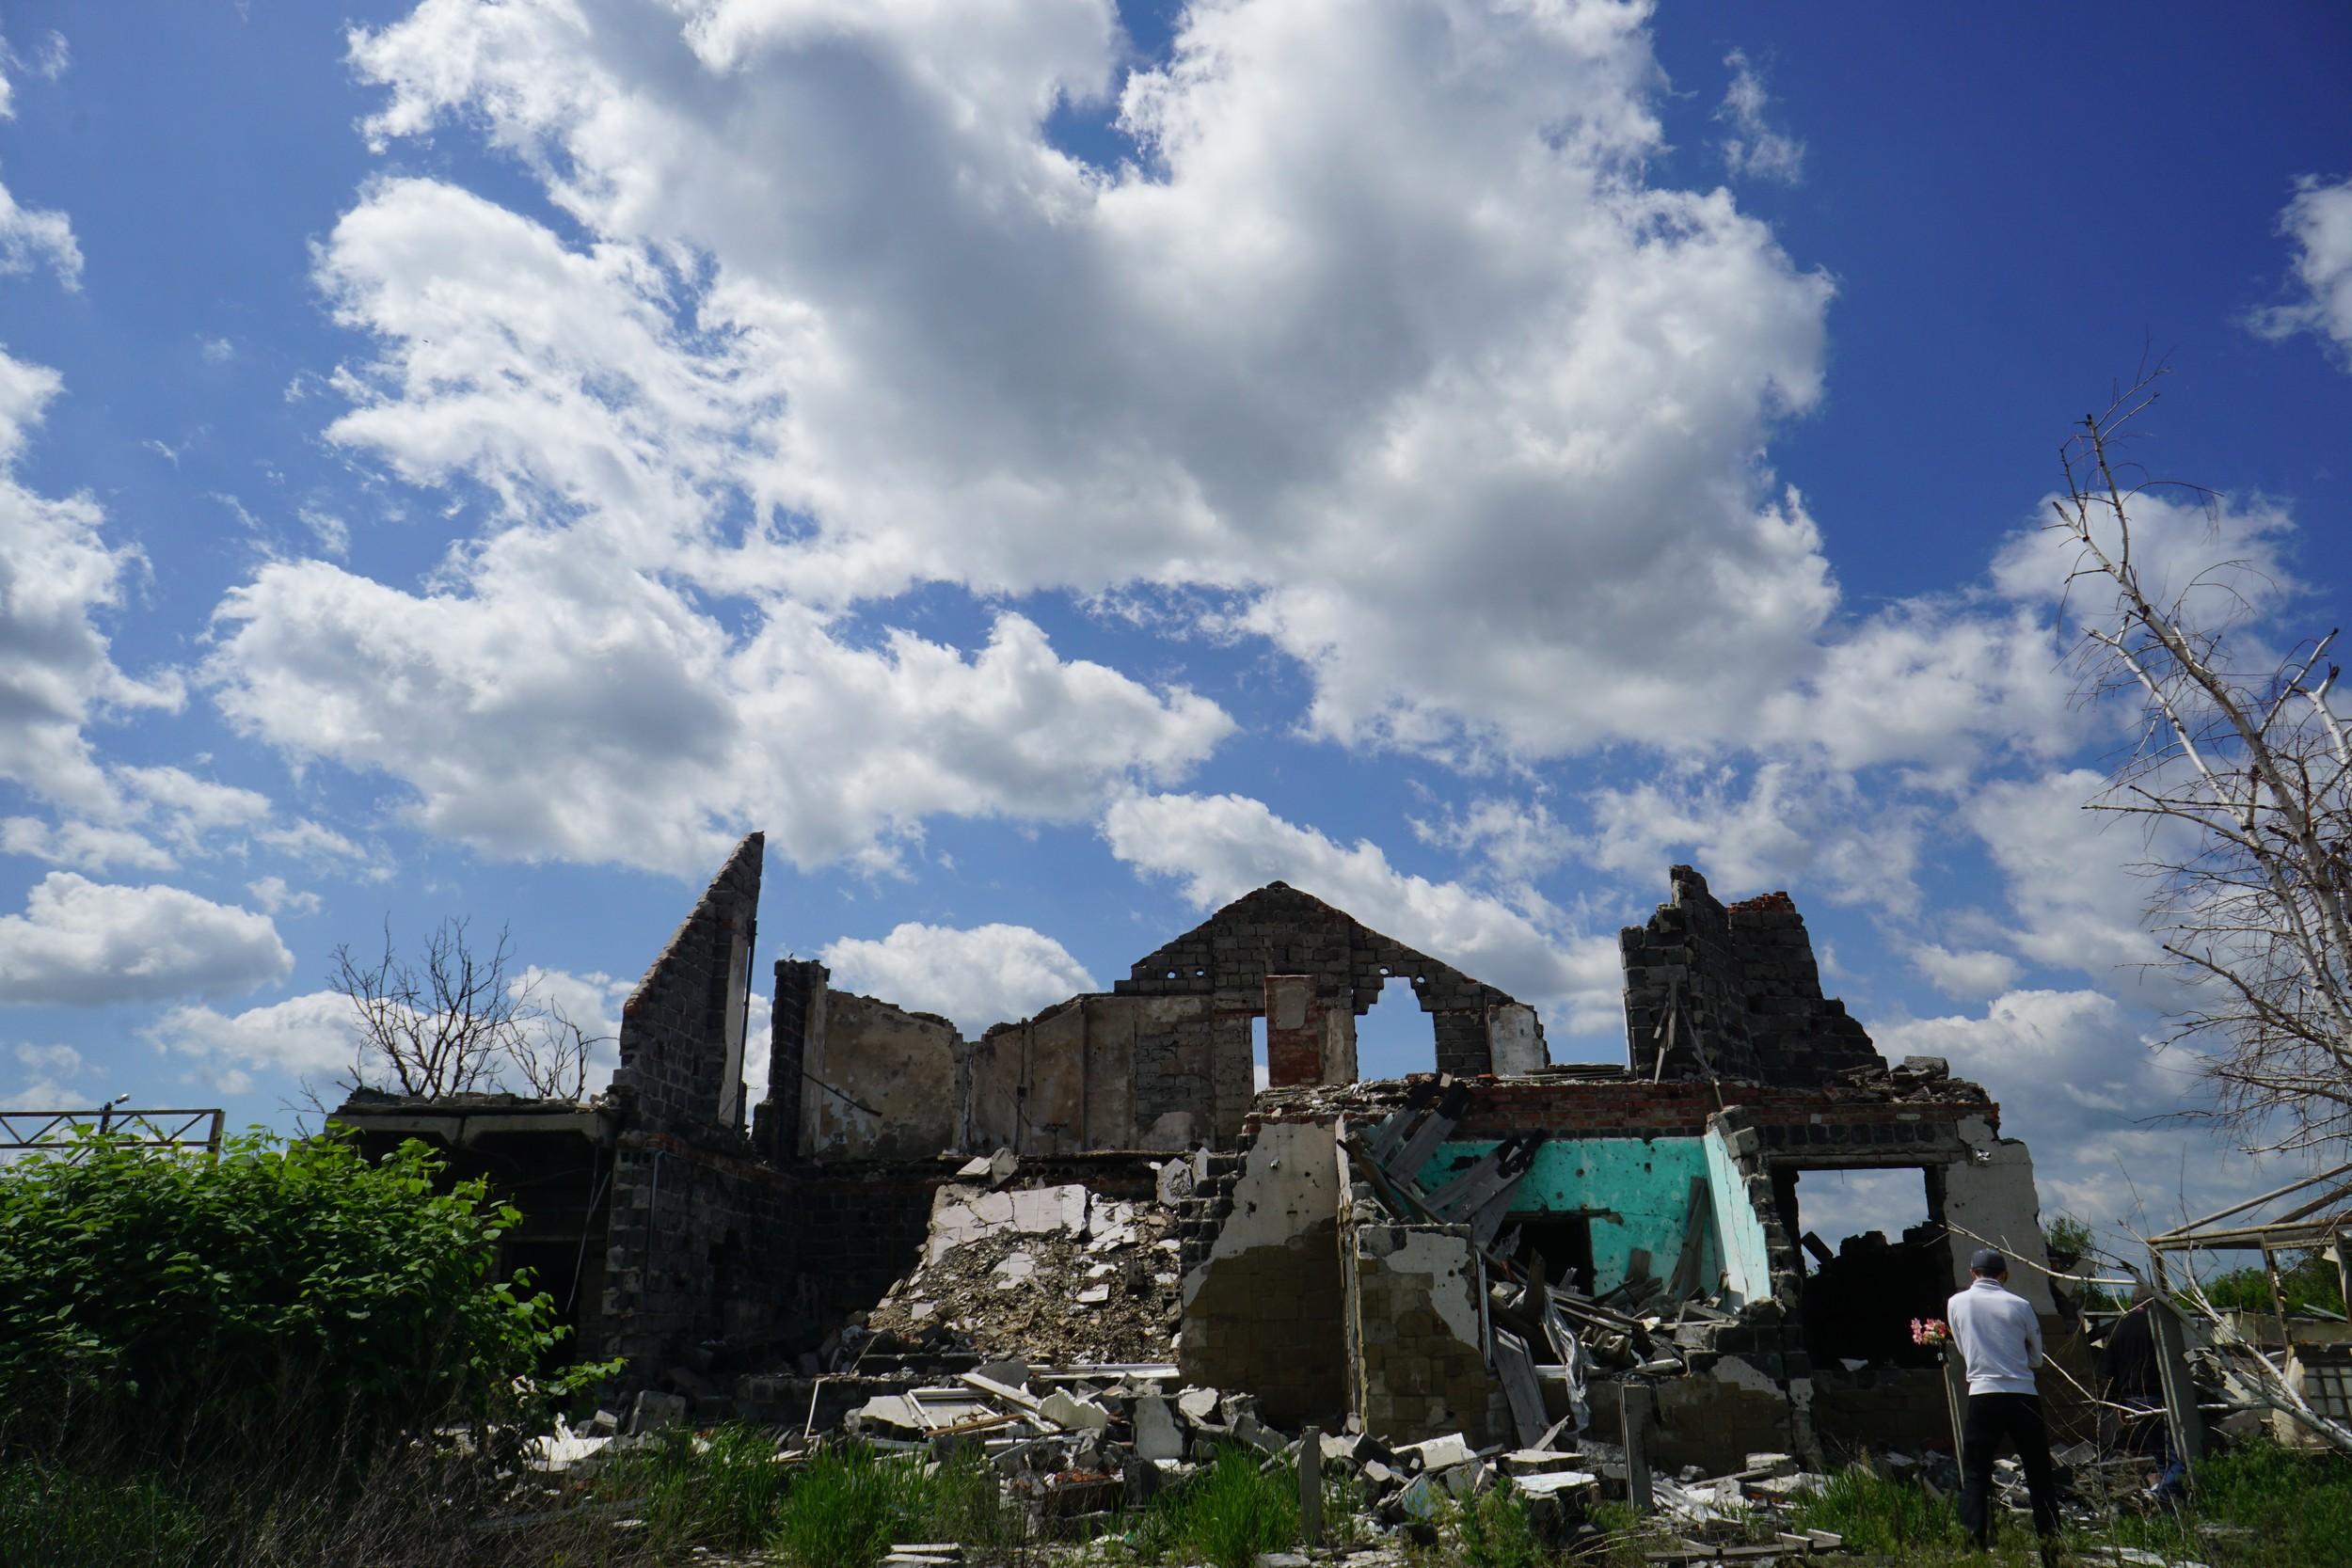 Building destroyed by recent war in Slavyansk, Ukraine.